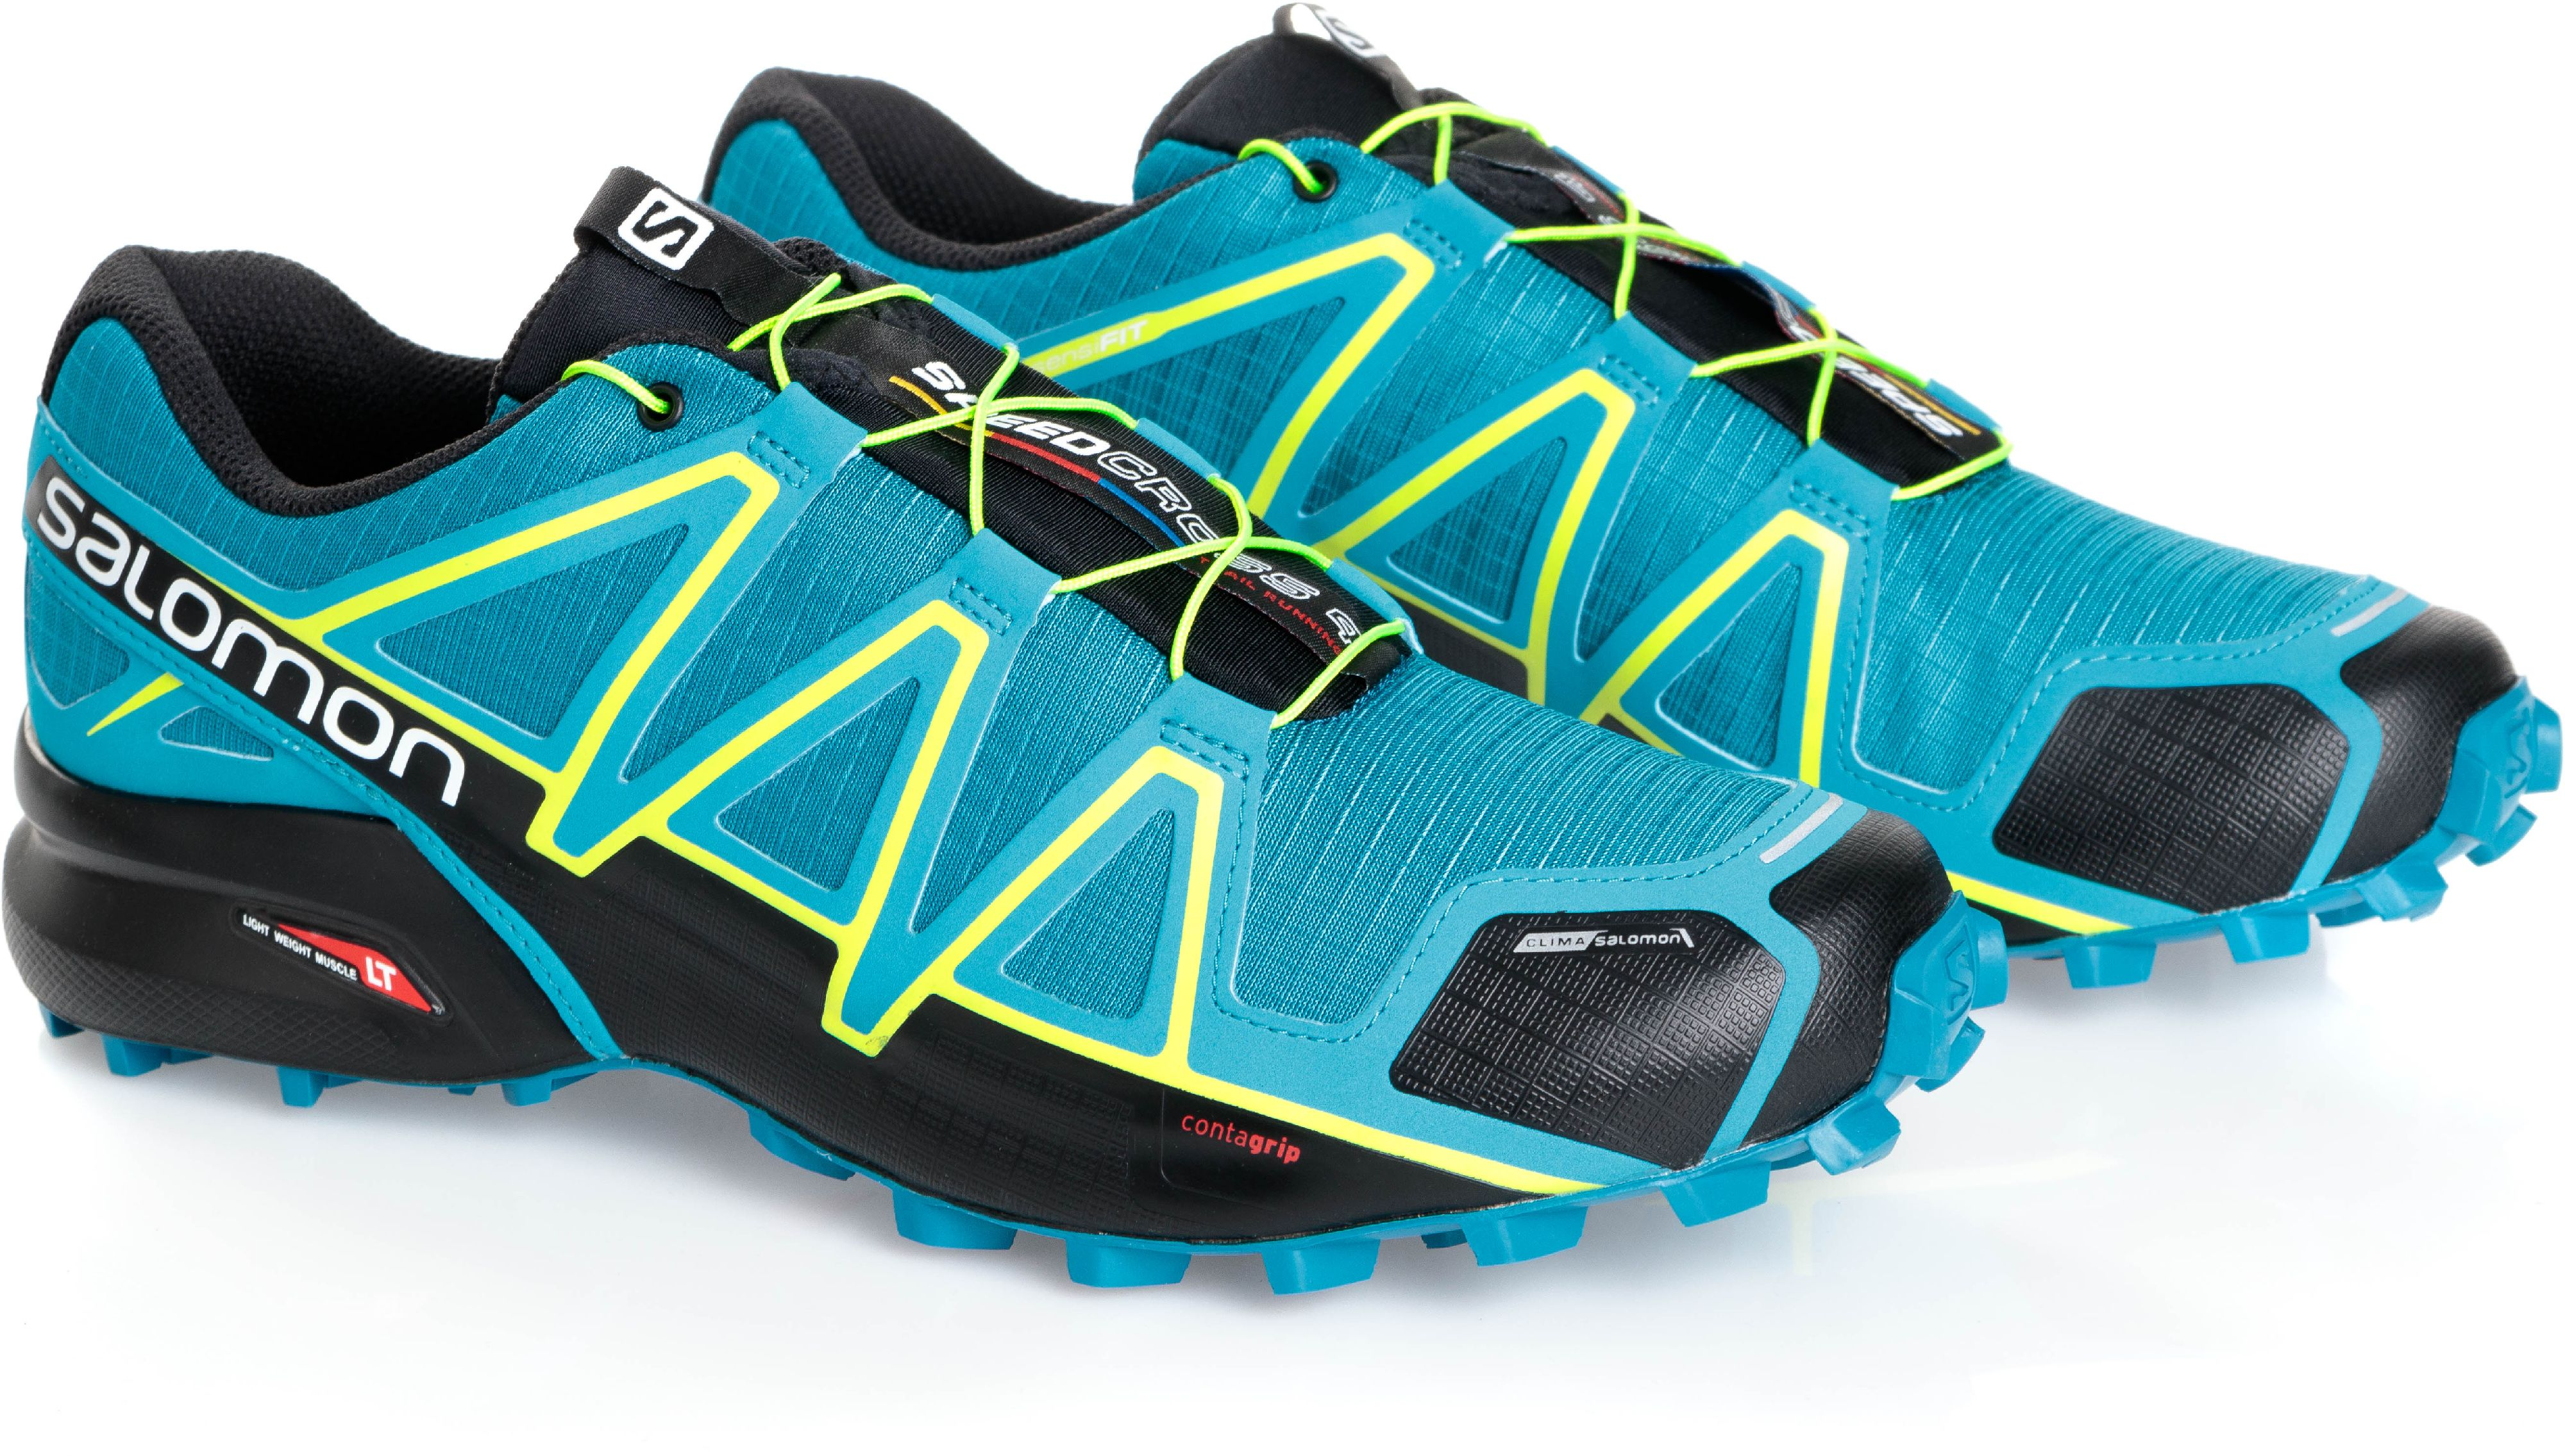 Salomon Buty meskie Speedcross 4 CS Mykonos Blue/Hawaiian Surf r. 42 (398425) 398425 Tūrisma apavi